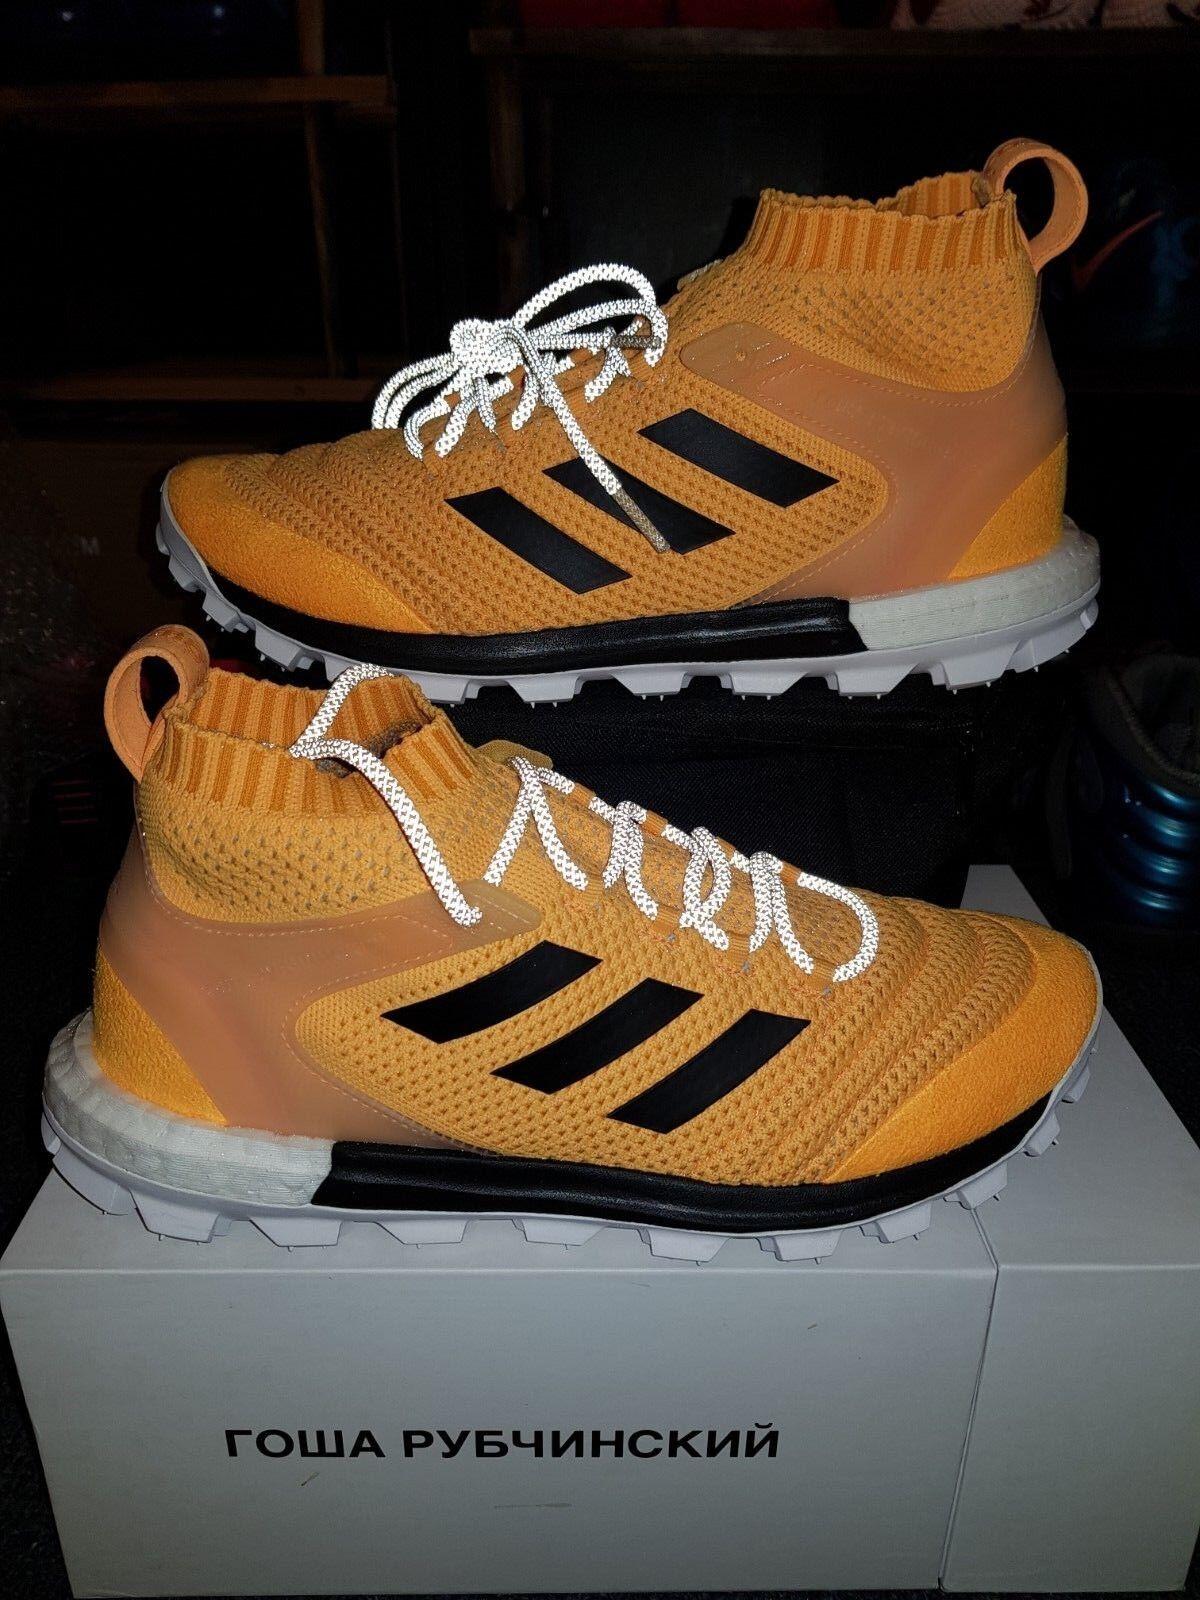 GOSHA RUBCHINSKIY pk x Adidas Copa PrimeKnit pk RUBCHINSKIY Amarillo Naranja BoostSZ 9 US 071d00